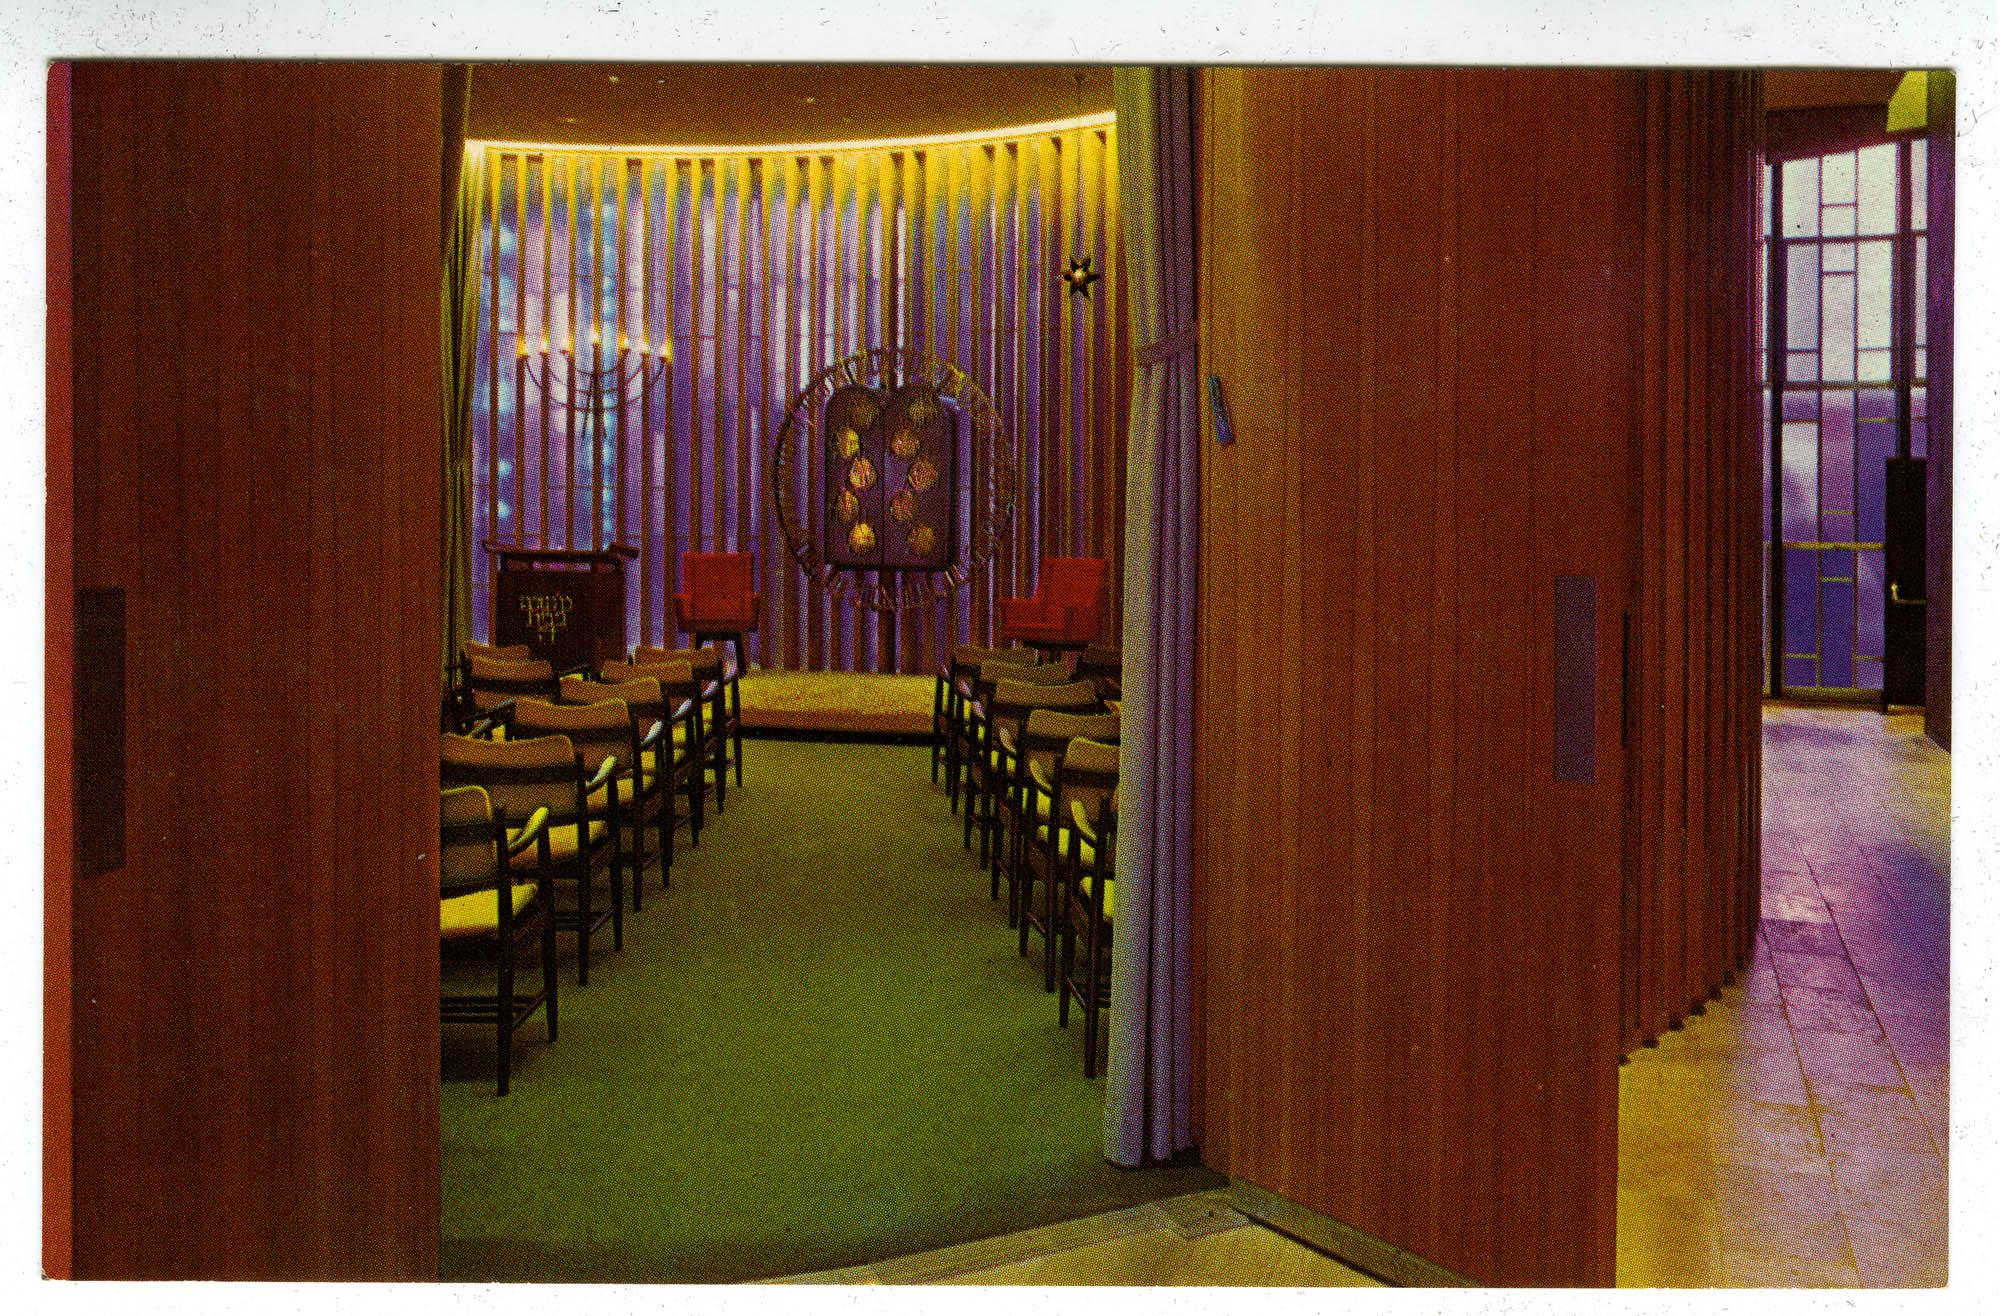 The Jewish Chapel, U.S. Air Force Academy, Colorado